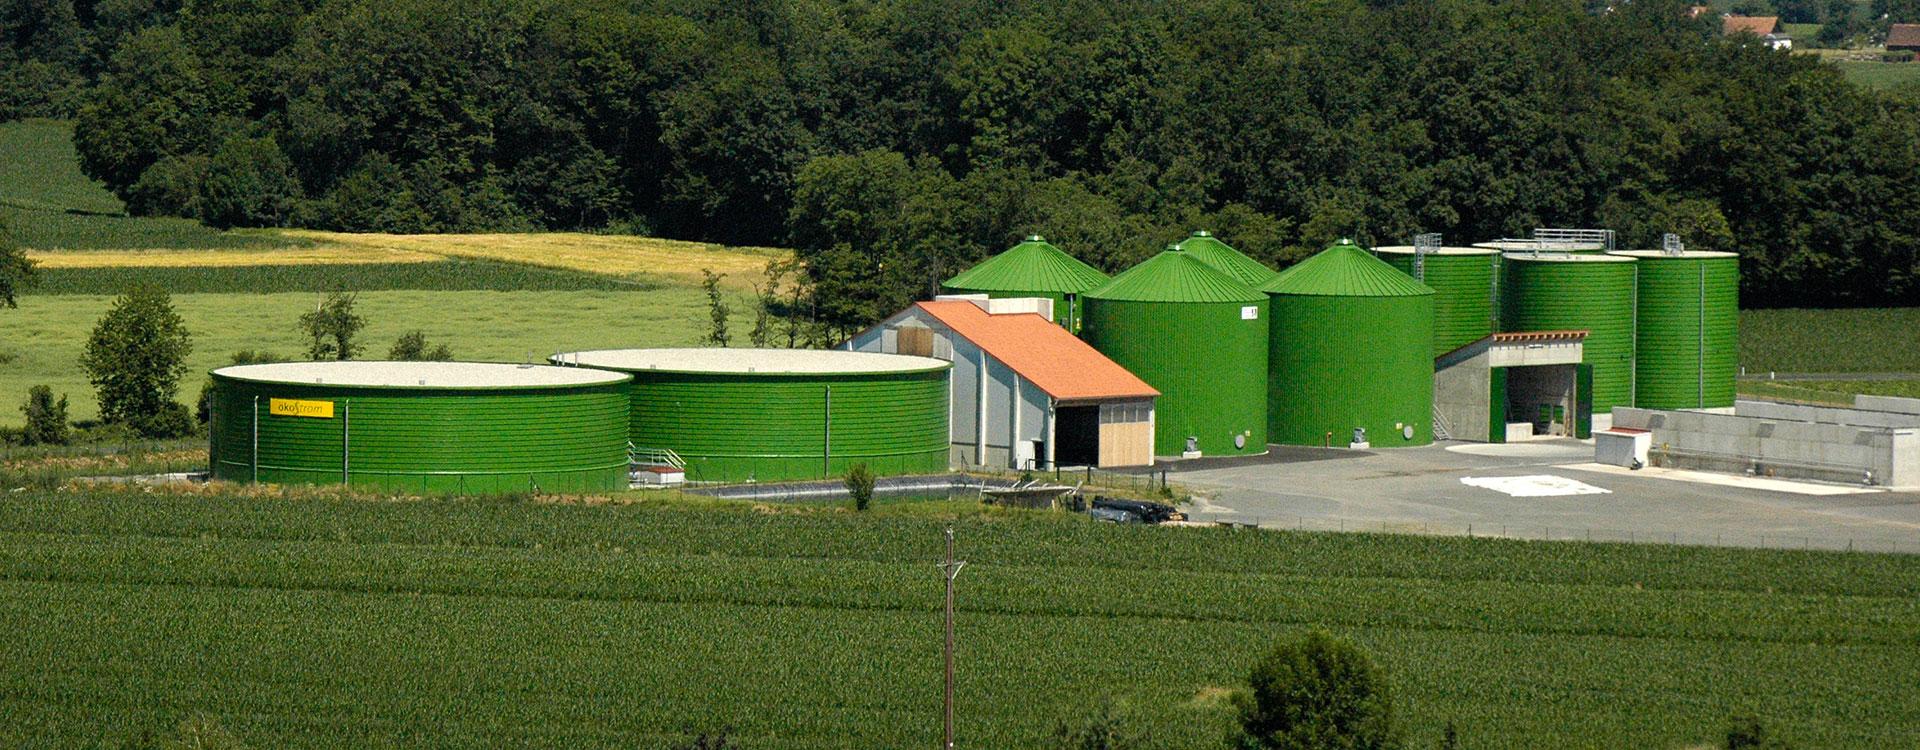 Liquid Manure Tank Roof - Lipp System